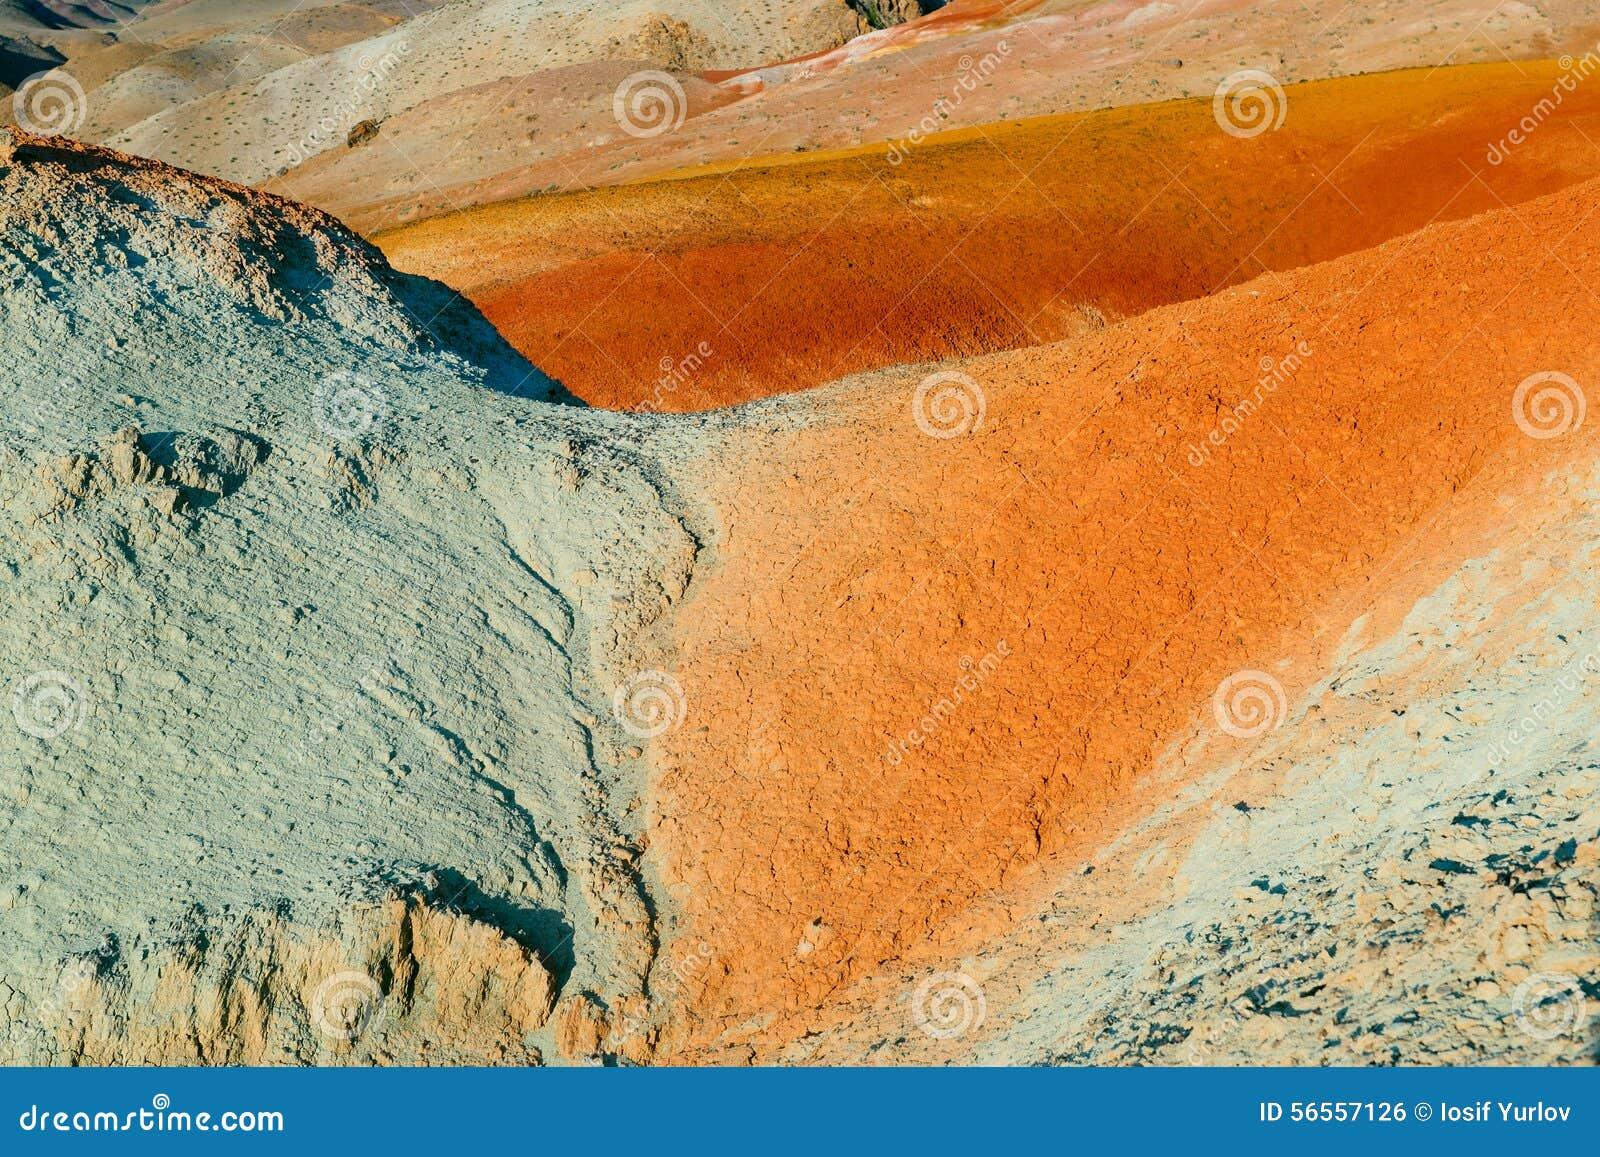 Download Χώμα χρώματος των καταθέσεων υδραργύρου Στοκ Εικόνες - εικόνα από σιβηρία, άργιλος: 56557126